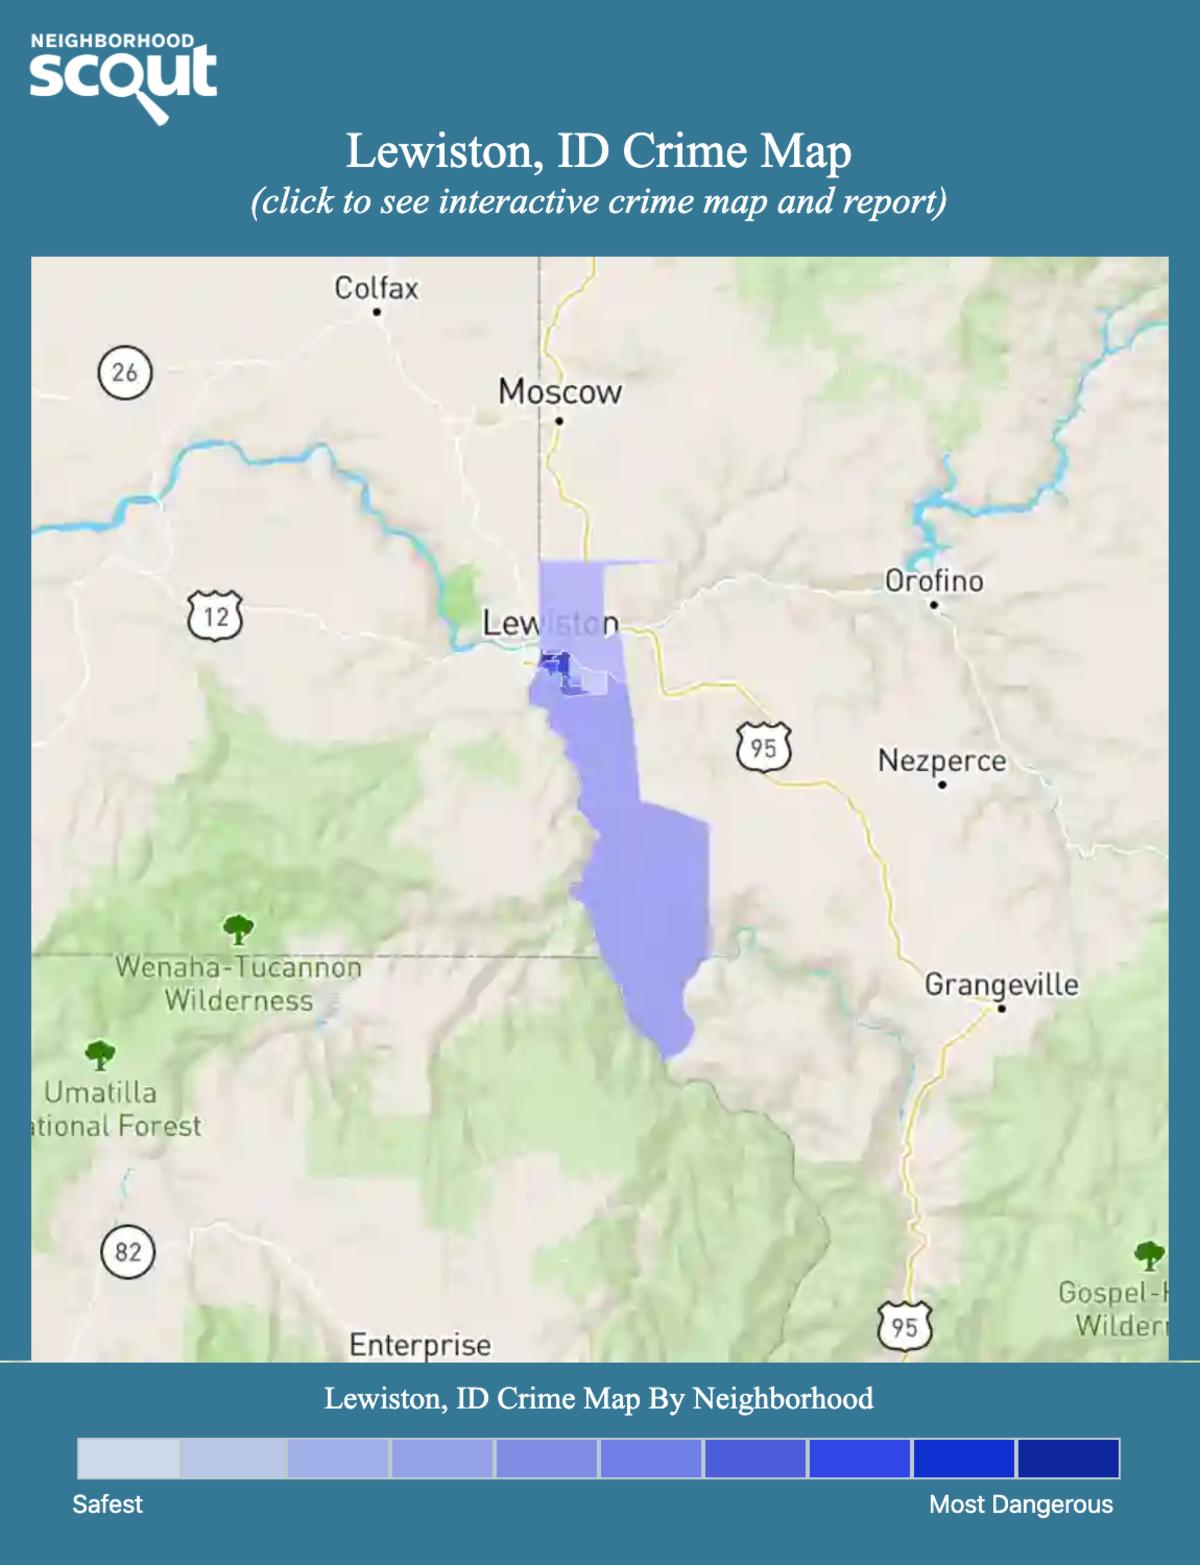 Lewiston, Idaho crime map